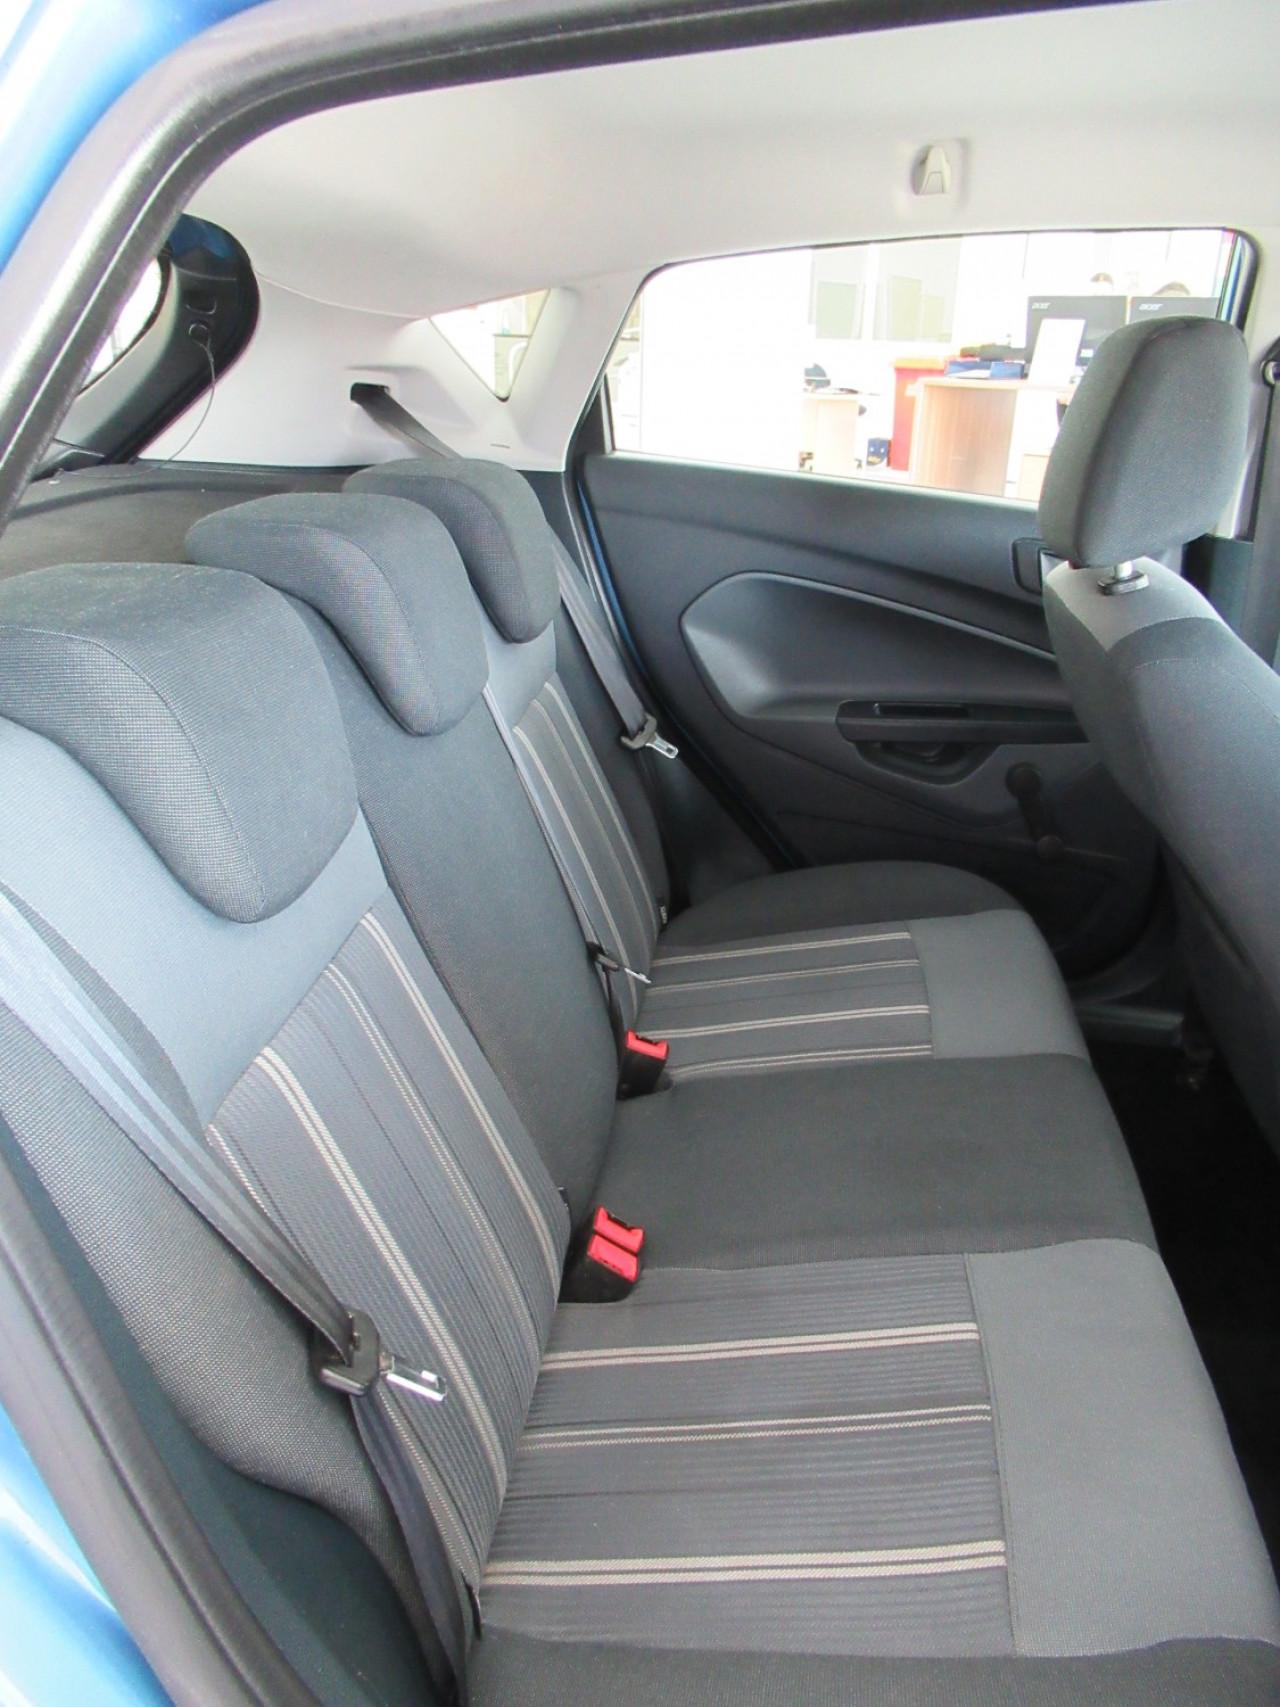 2009 Ford Fiesta WS CL Hatchback Image 18